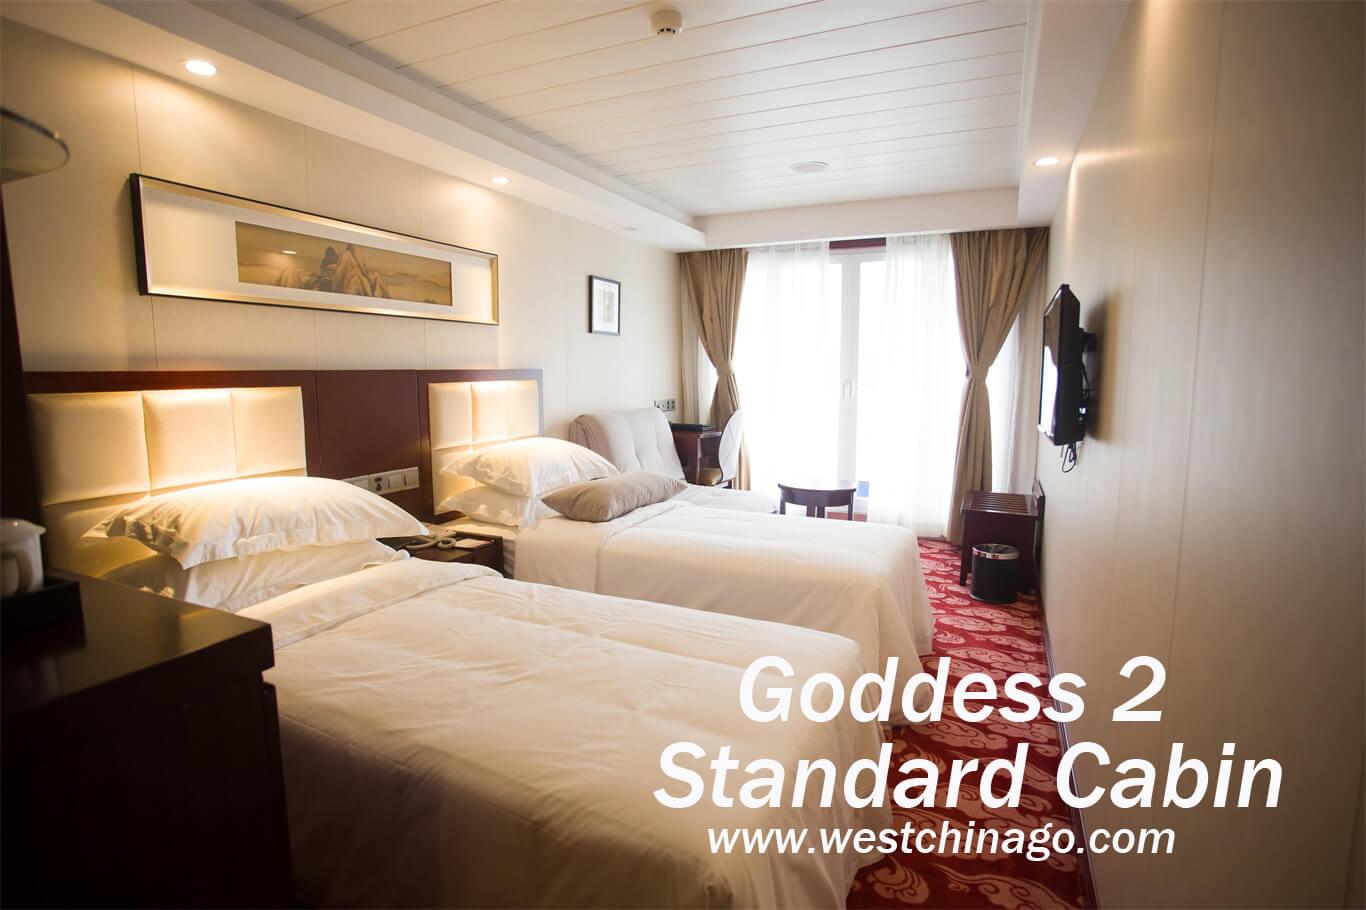 Goddess 2 standard cabin